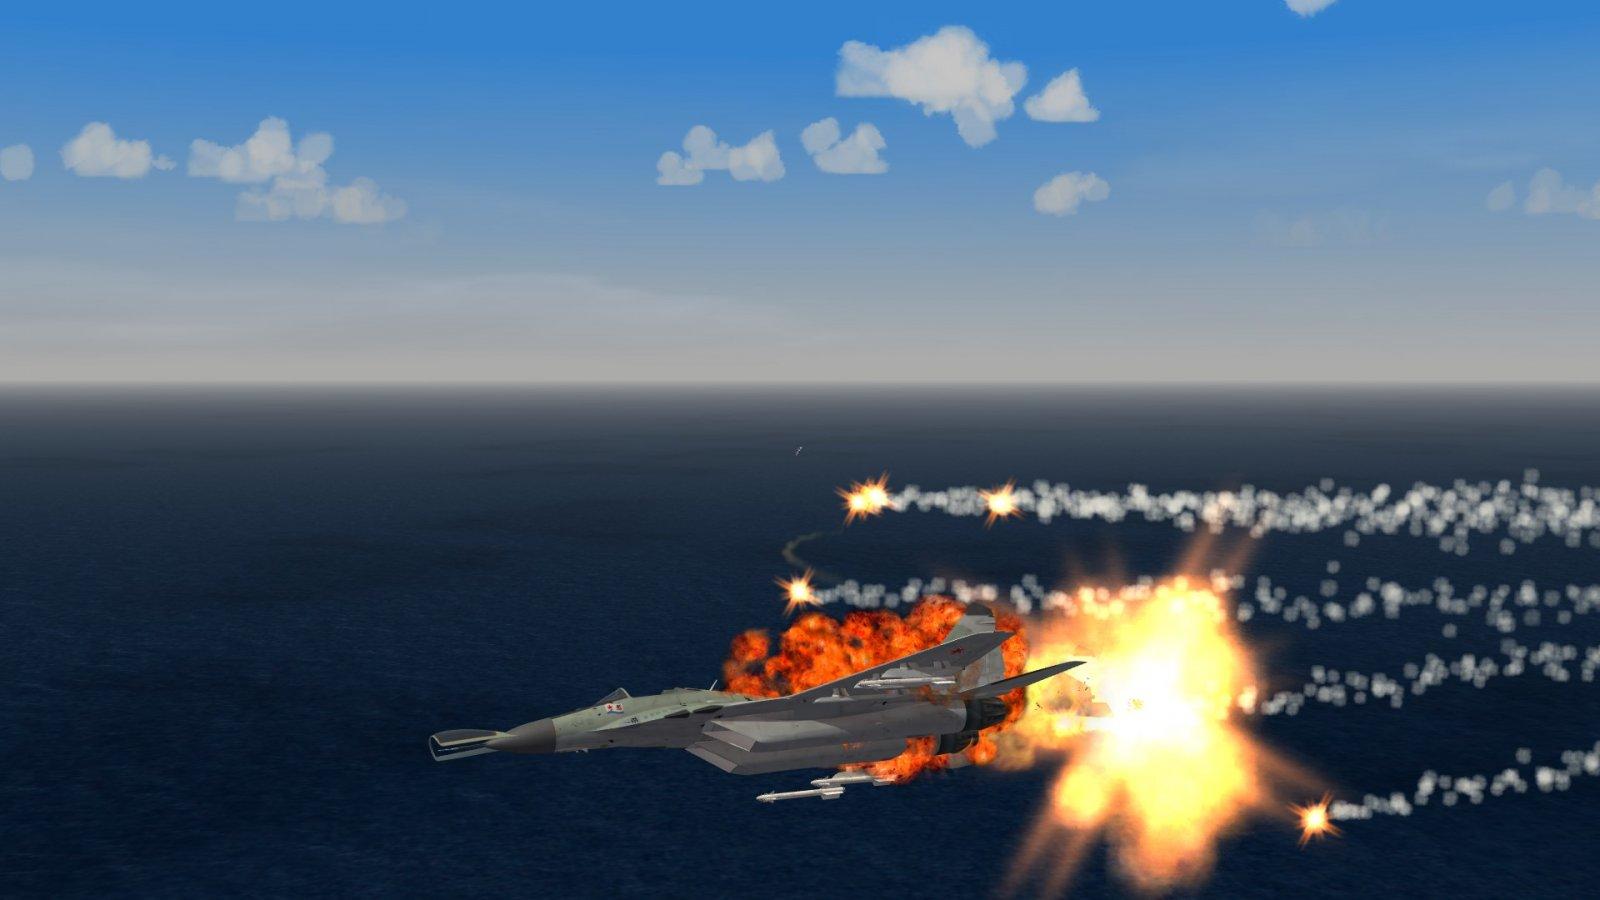 MiG-29 blowing up...